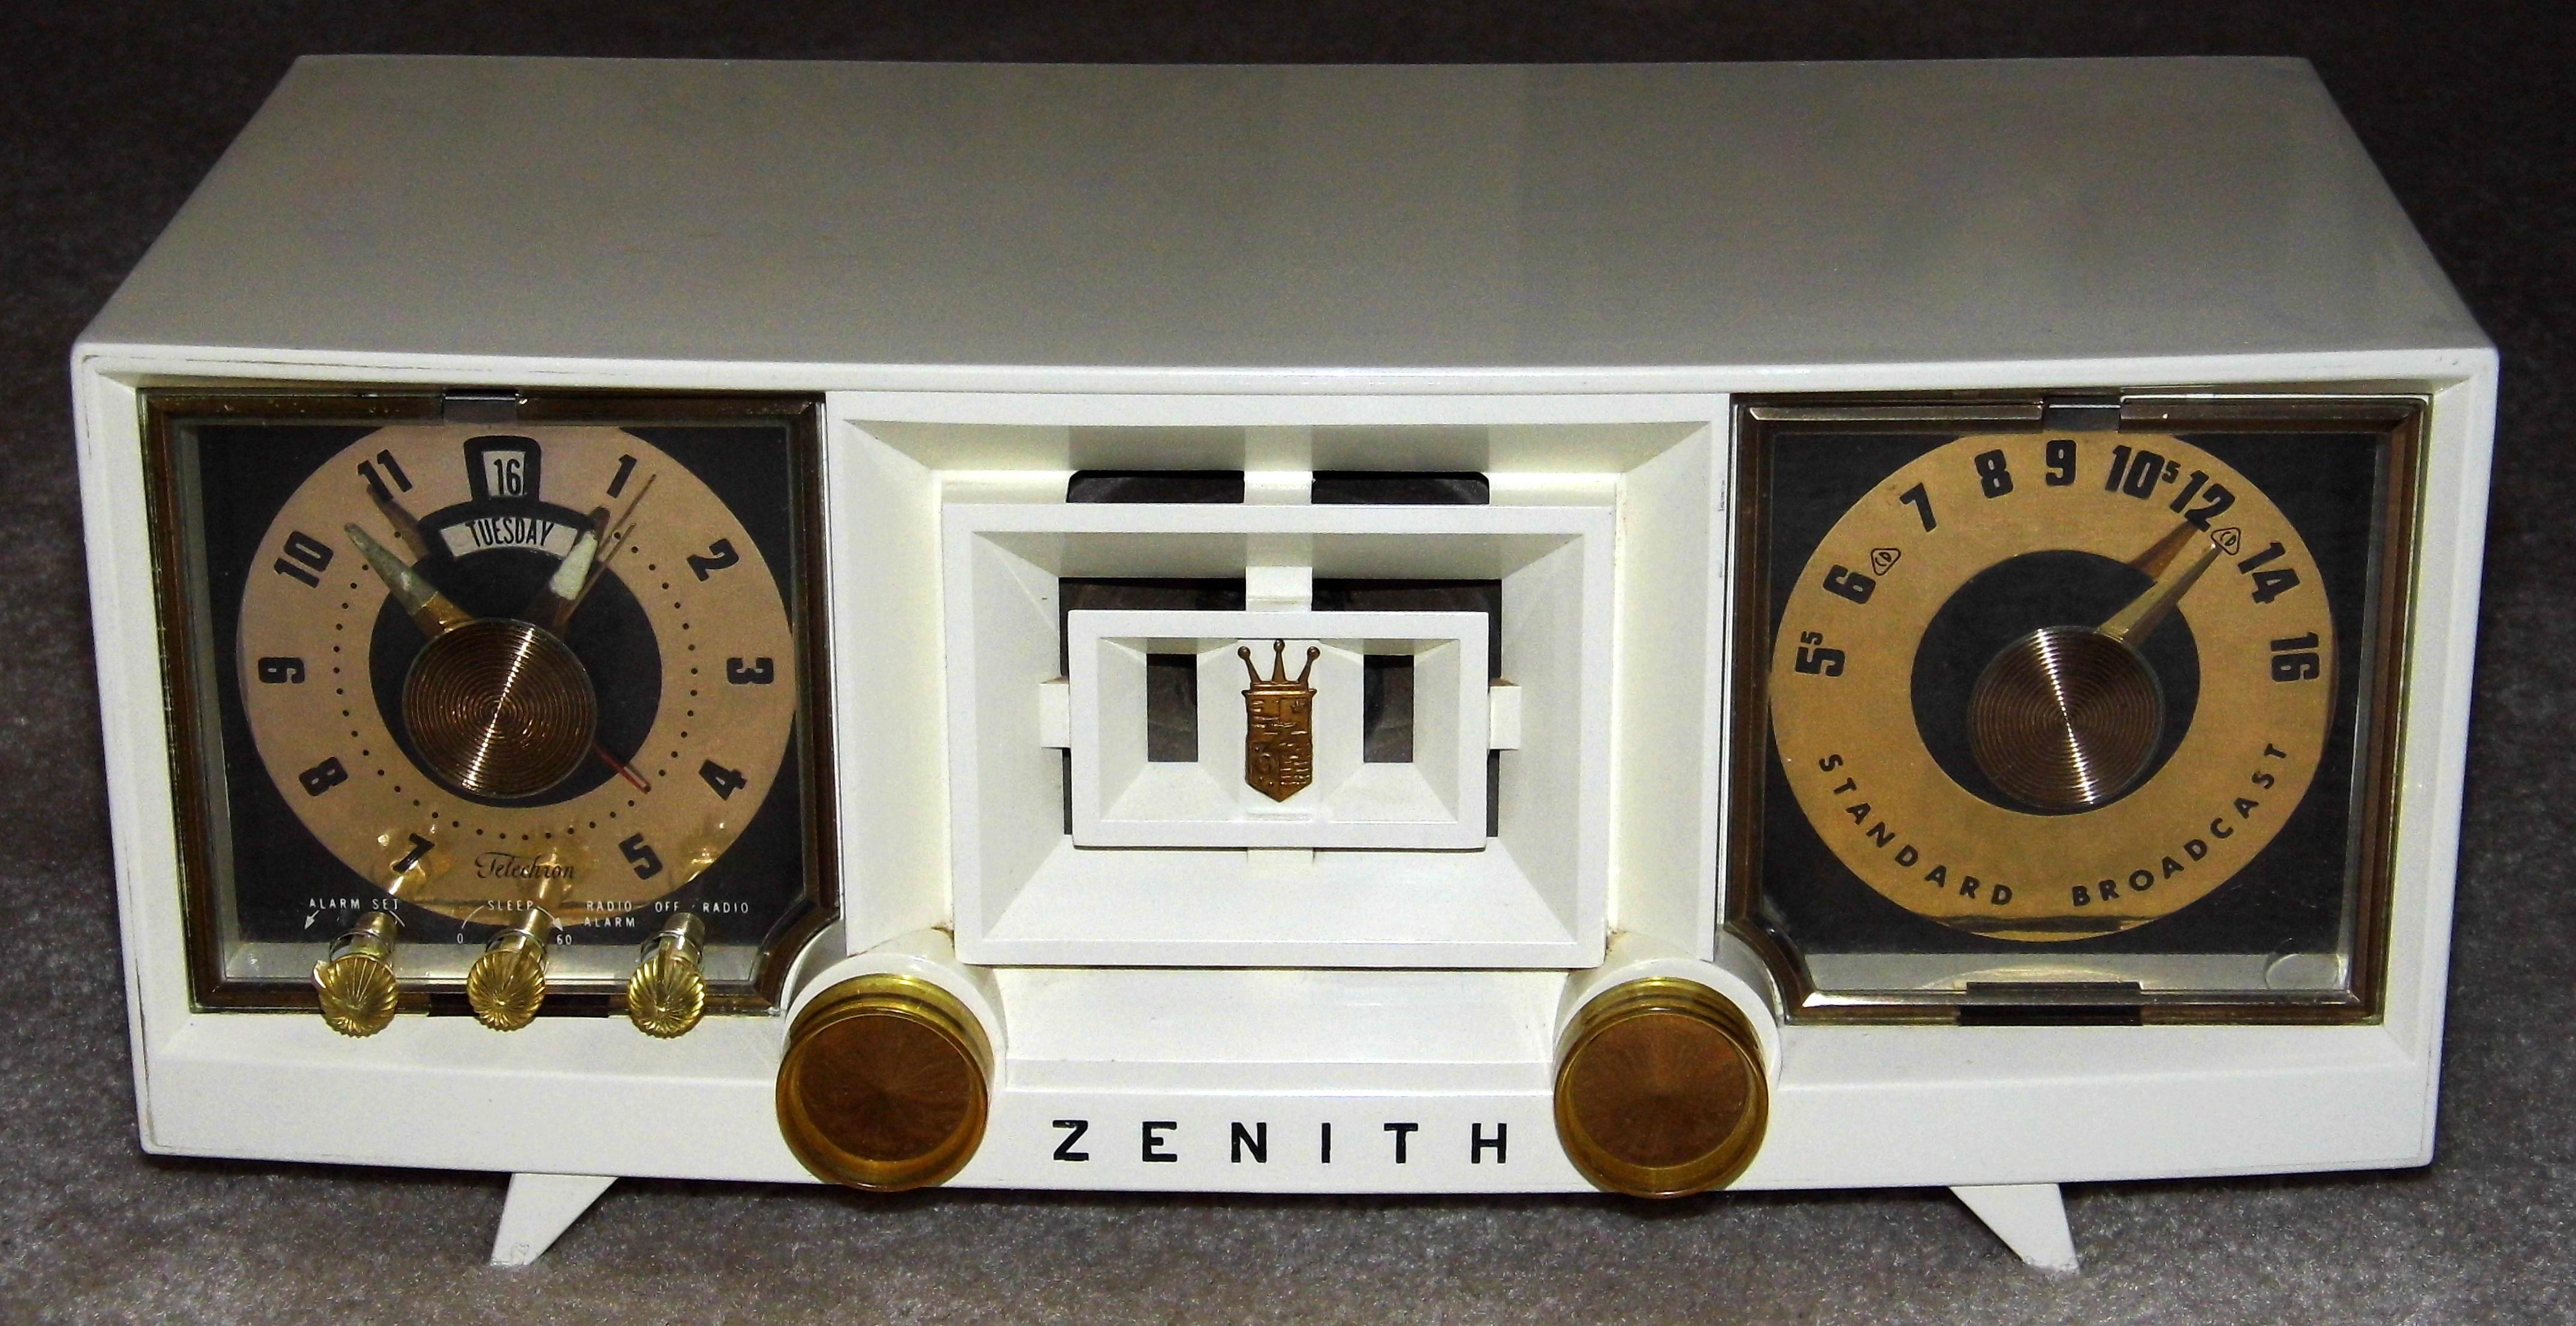 Zenith Model ZG120M Vintage AM FM Clock Radio Digital ... |Zenith Clock Radio